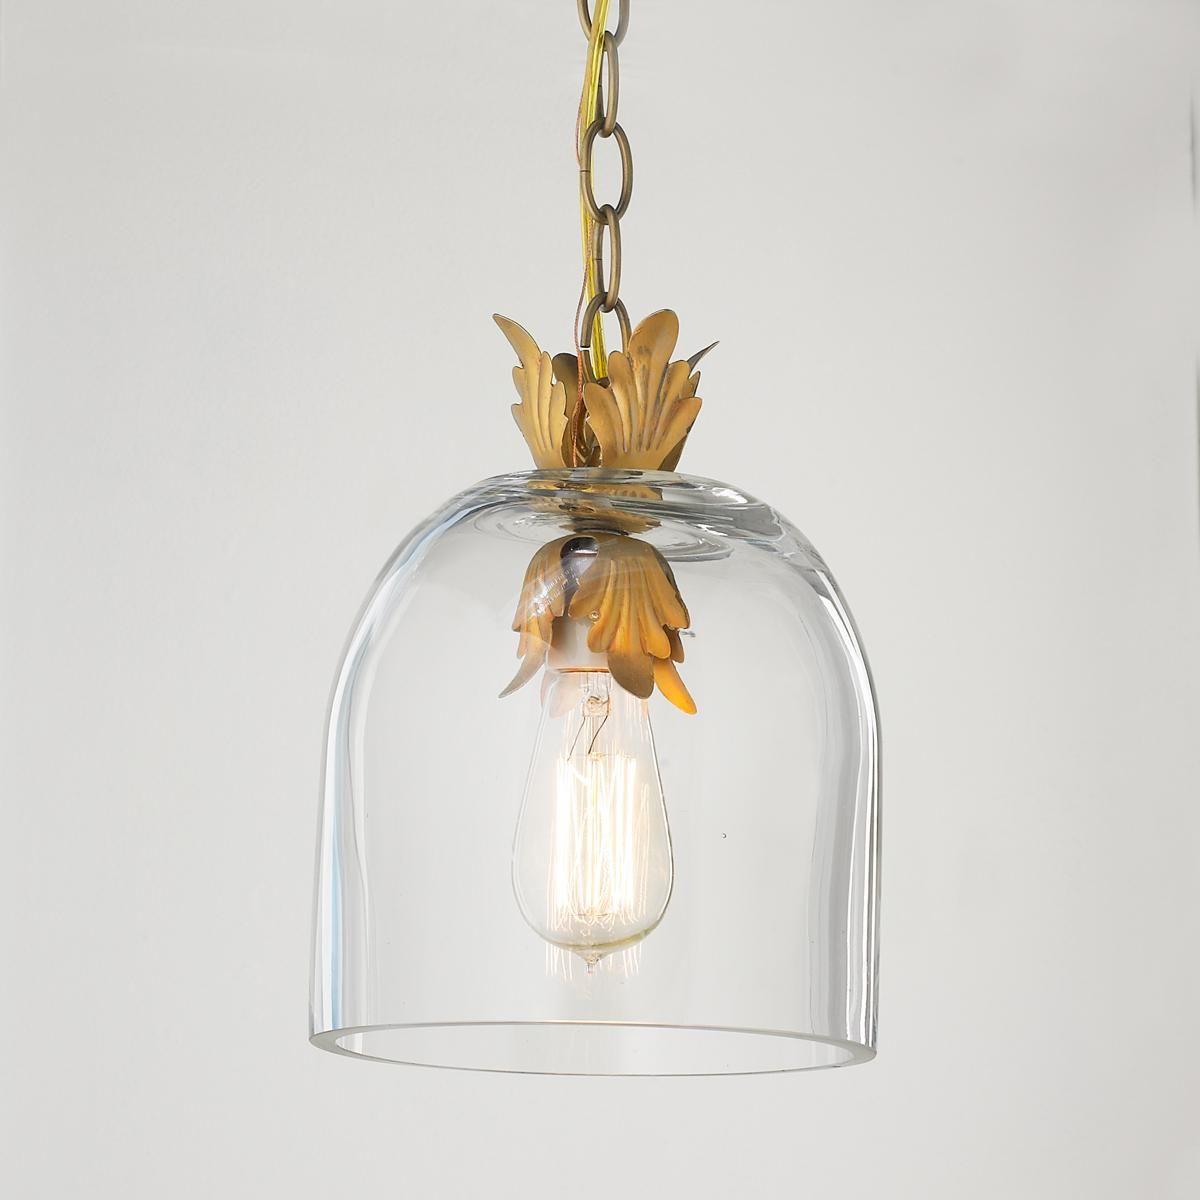 Acanthus Leaf Dome Pendant Light Dome Pendant Lighting Gold